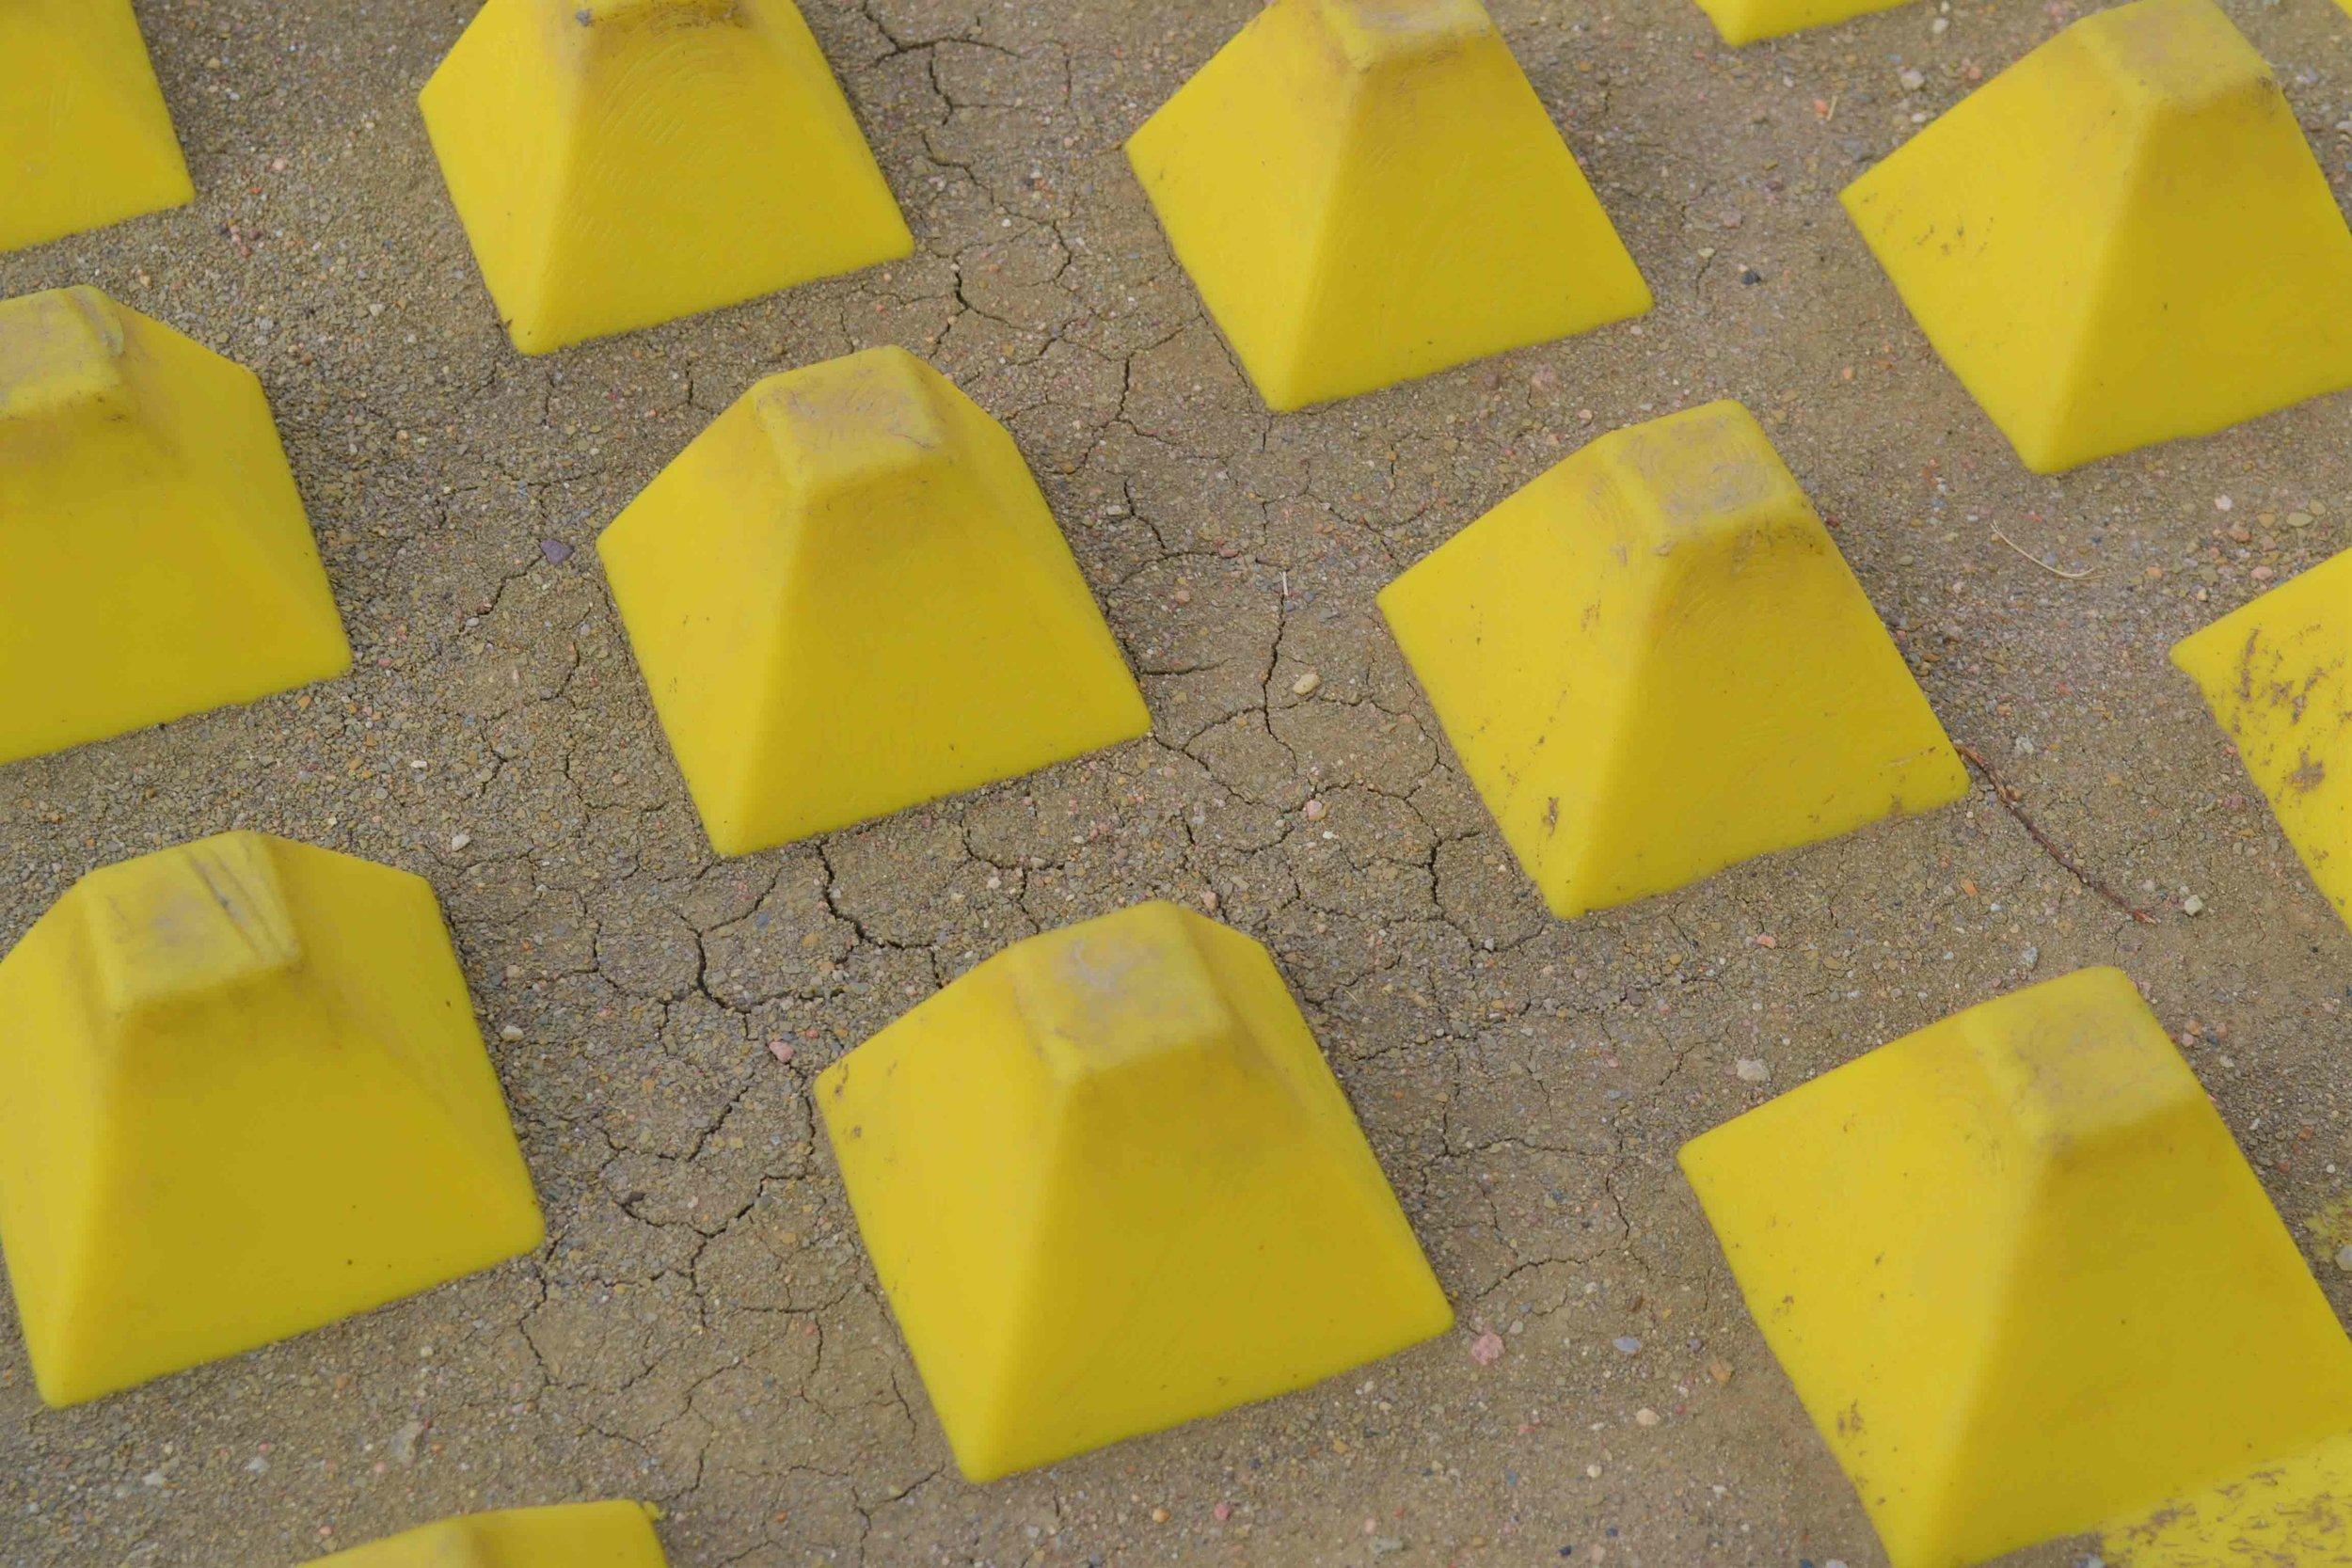 CU_constructionEntranceBMPOnPavement_stabilizedConstructionEntrance_constructionMaterials_PlasticConstructionPanelMats_bmpConstructionEntrance_rumblePlates_compositeExitGrids_FODS.jpg